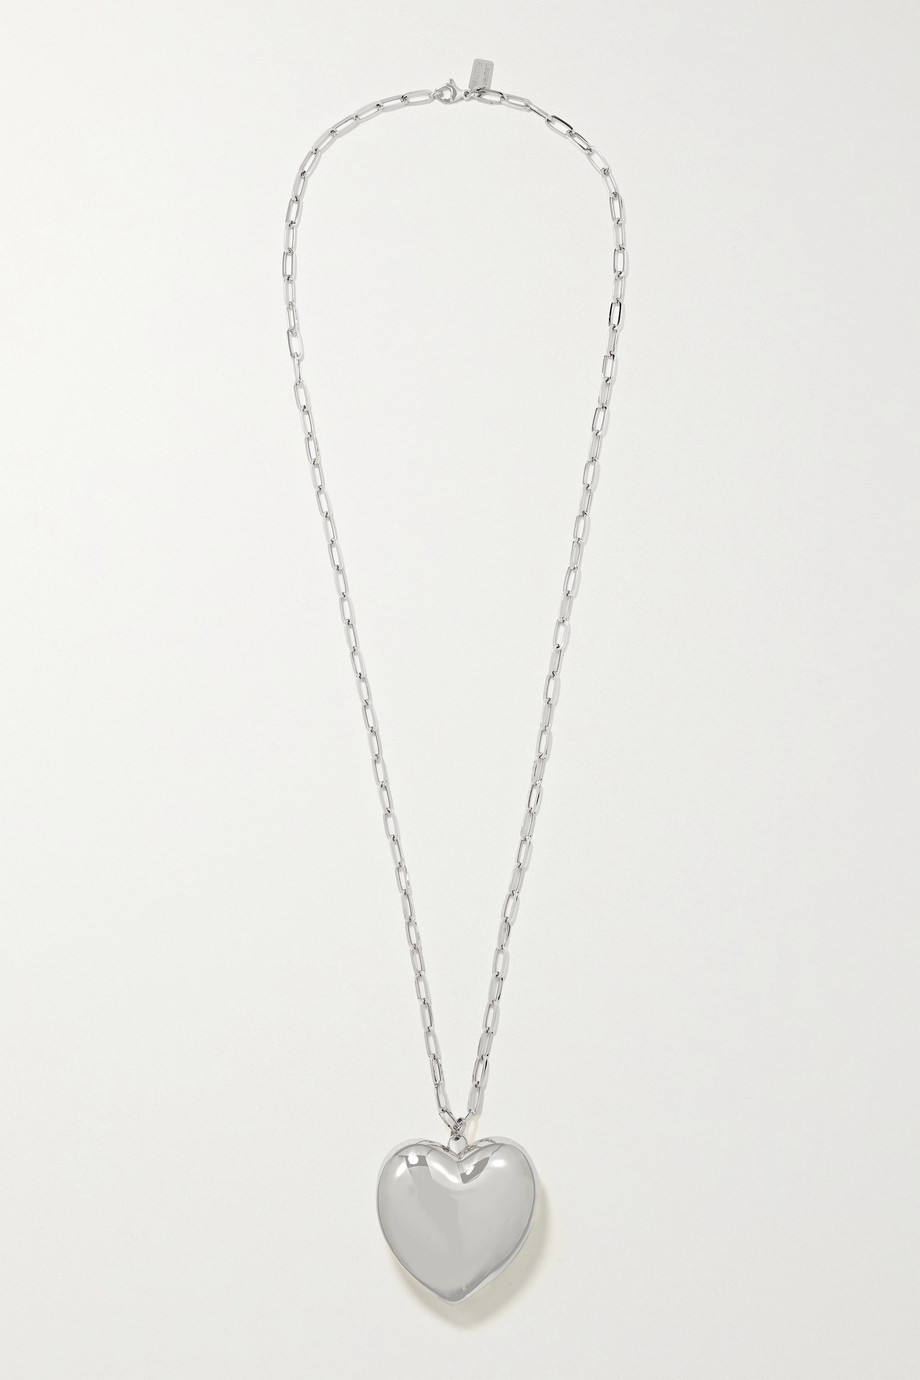 Lauren Rubinski Collier en or blanc 14 carats